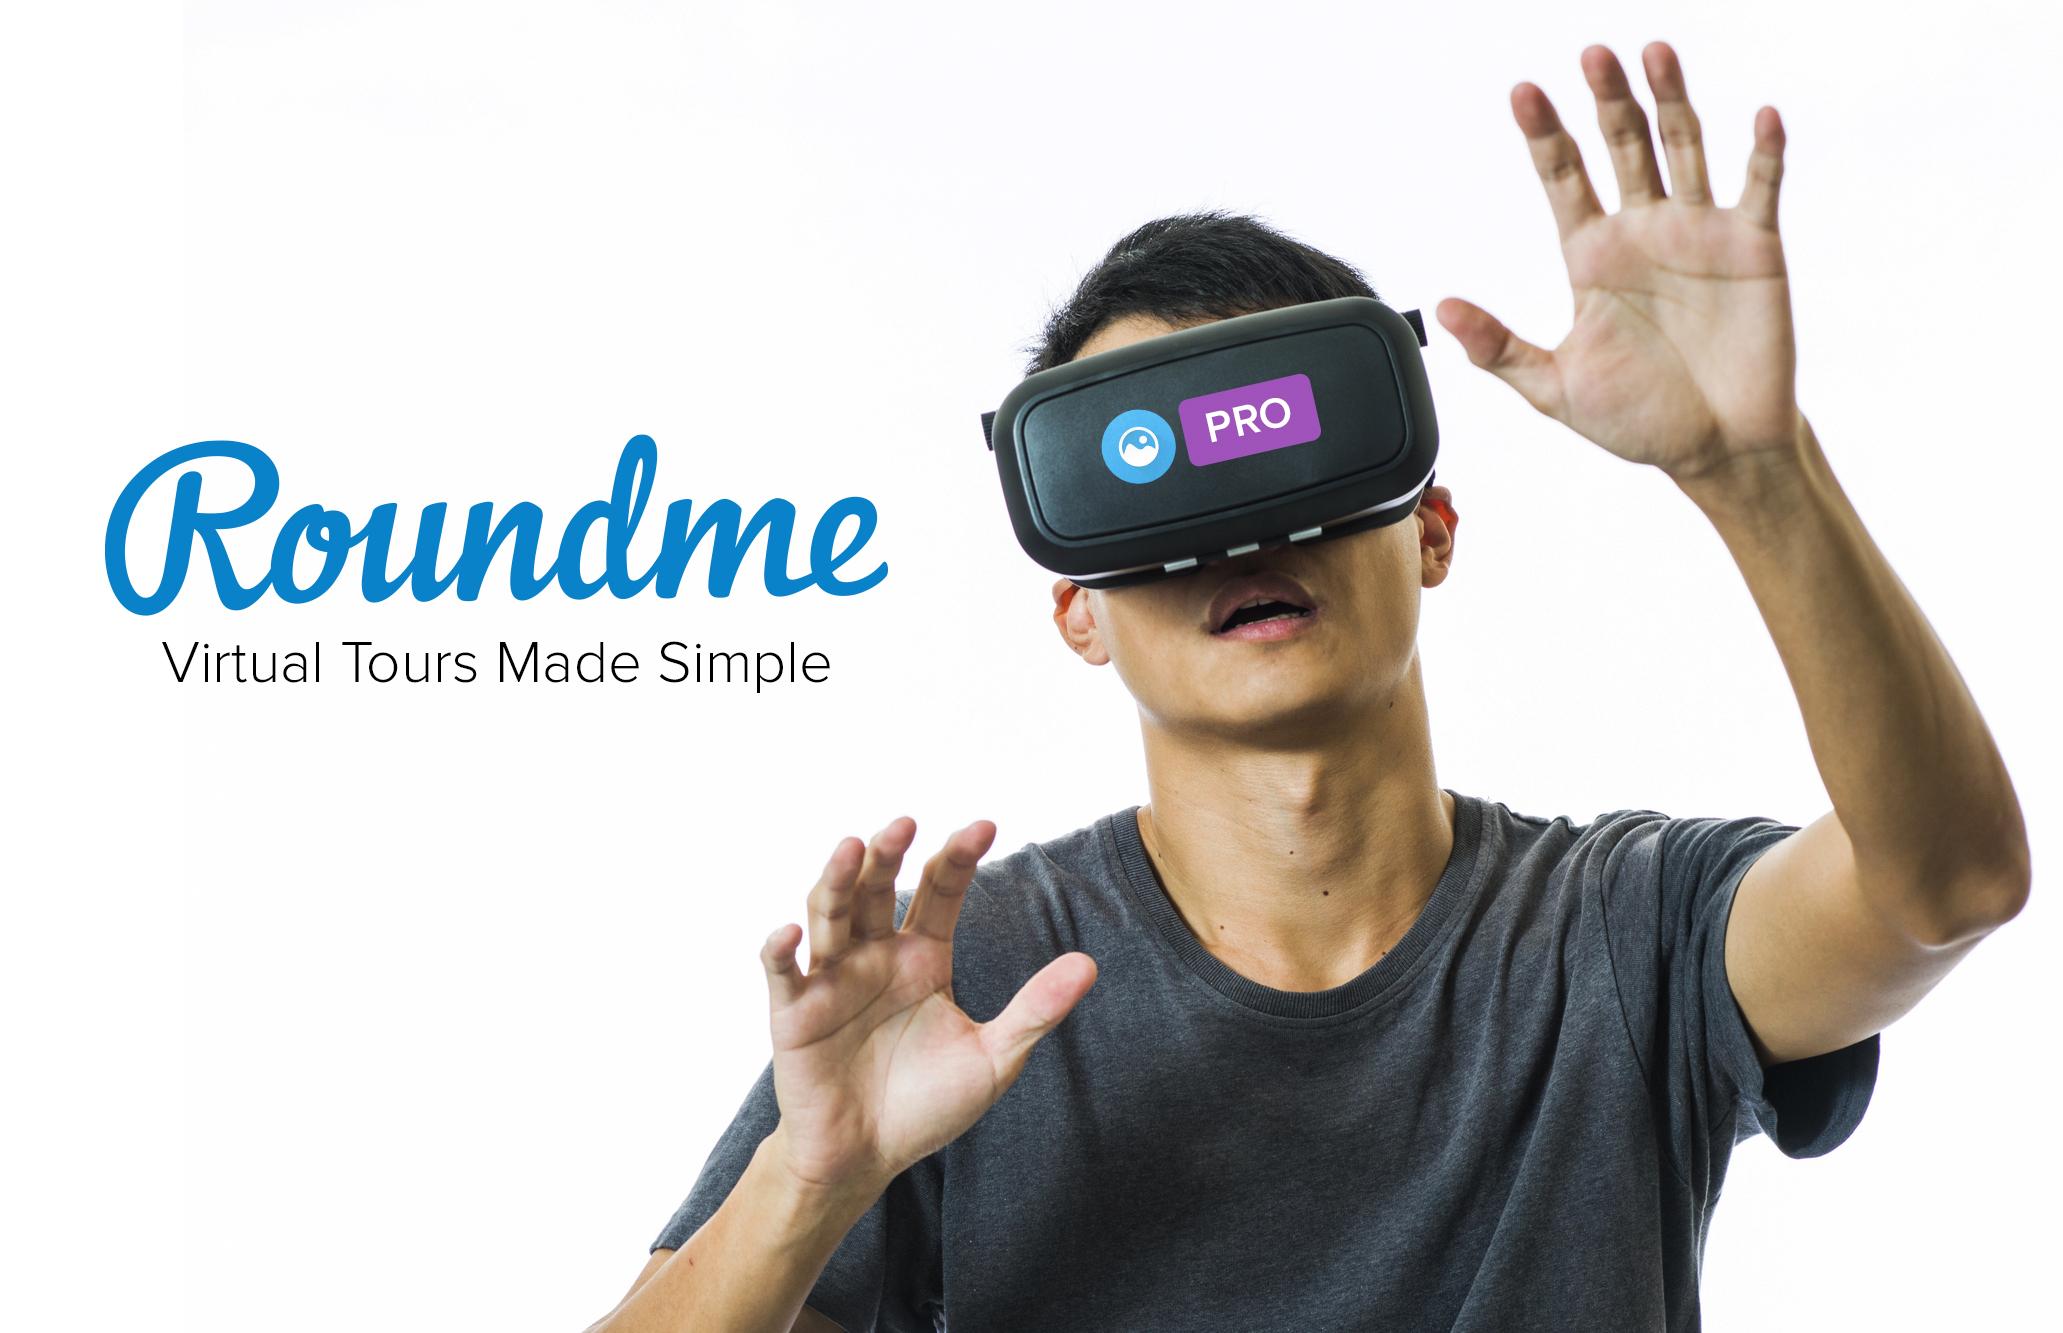 Roundme Breaks into the Professional 360º VR Visualization Market